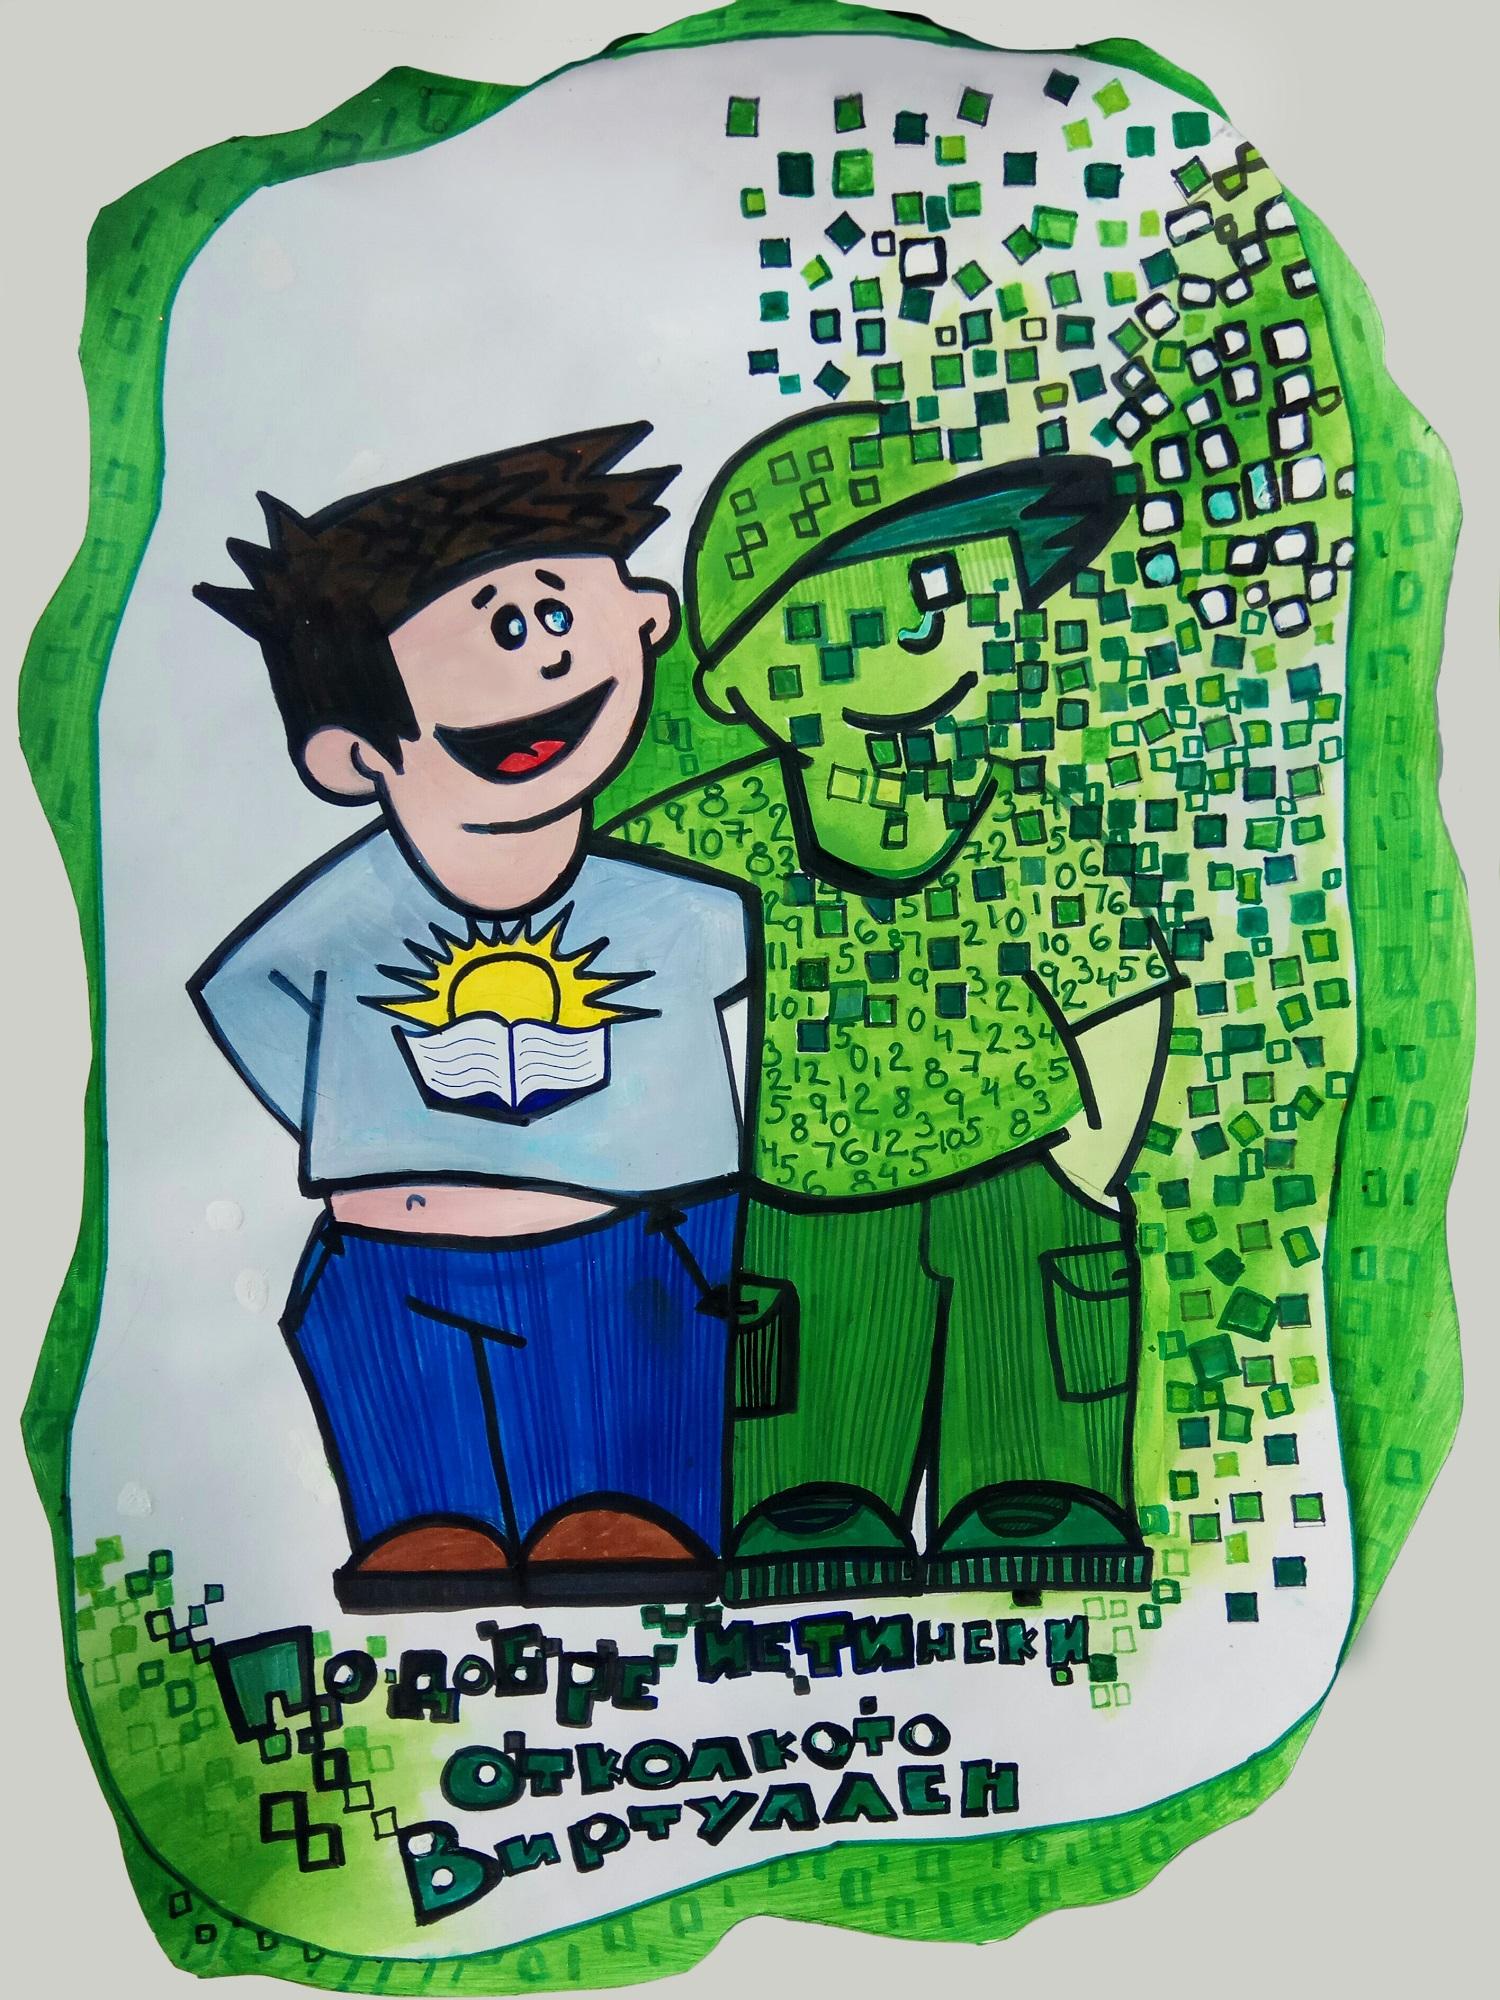 инициатива на Cartoon Network